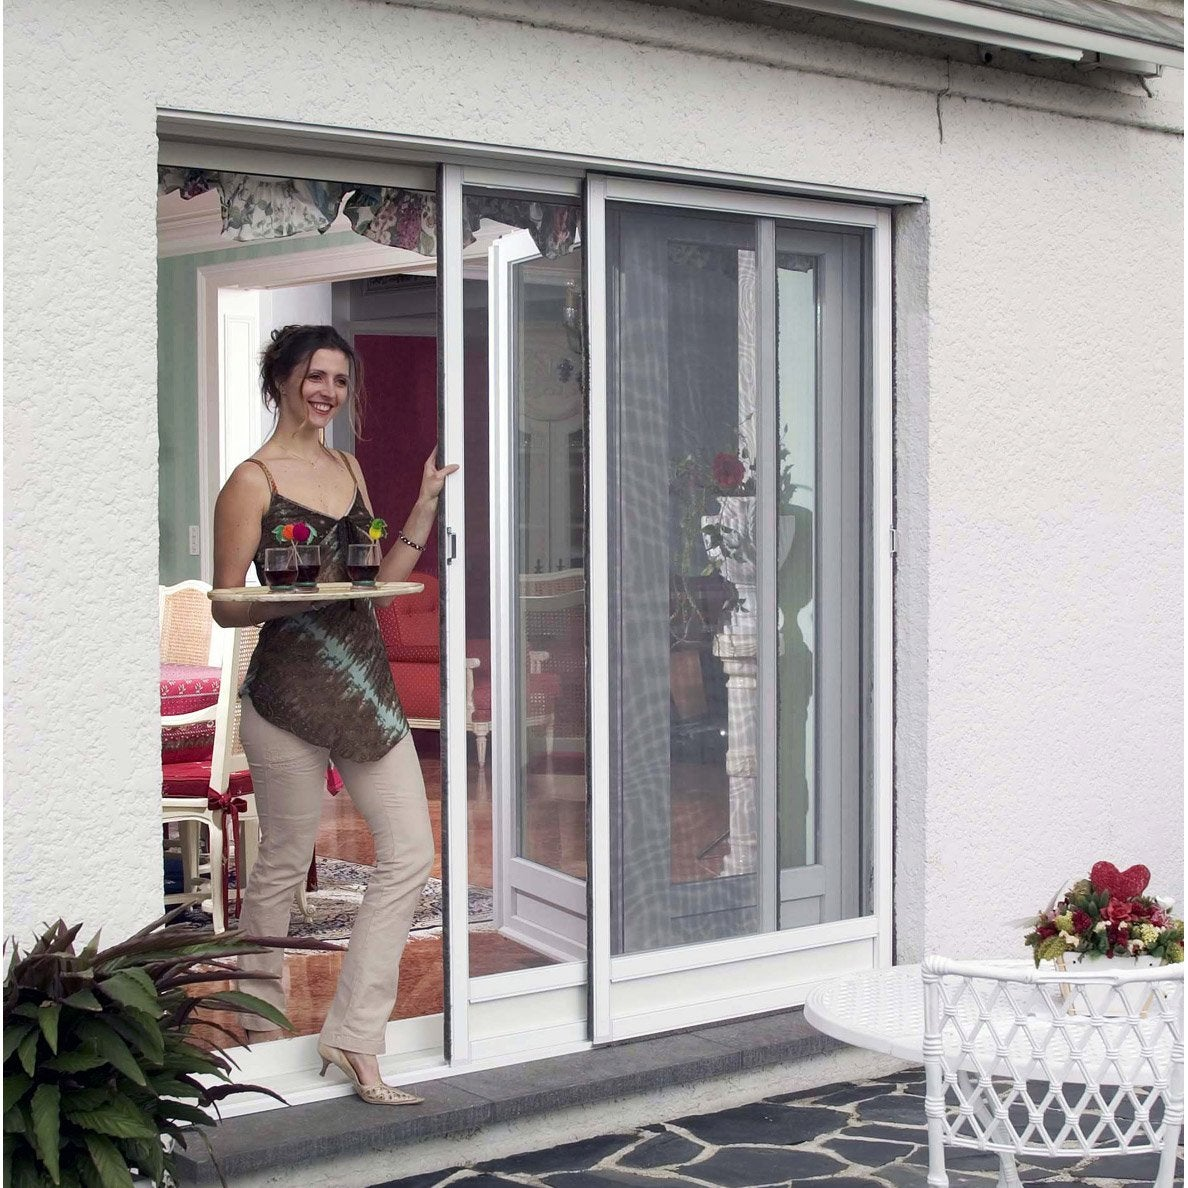 moustiquaire baie coulissante moustikit 240x160 cm leroy merlin. Black Bedroom Furniture Sets. Home Design Ideas